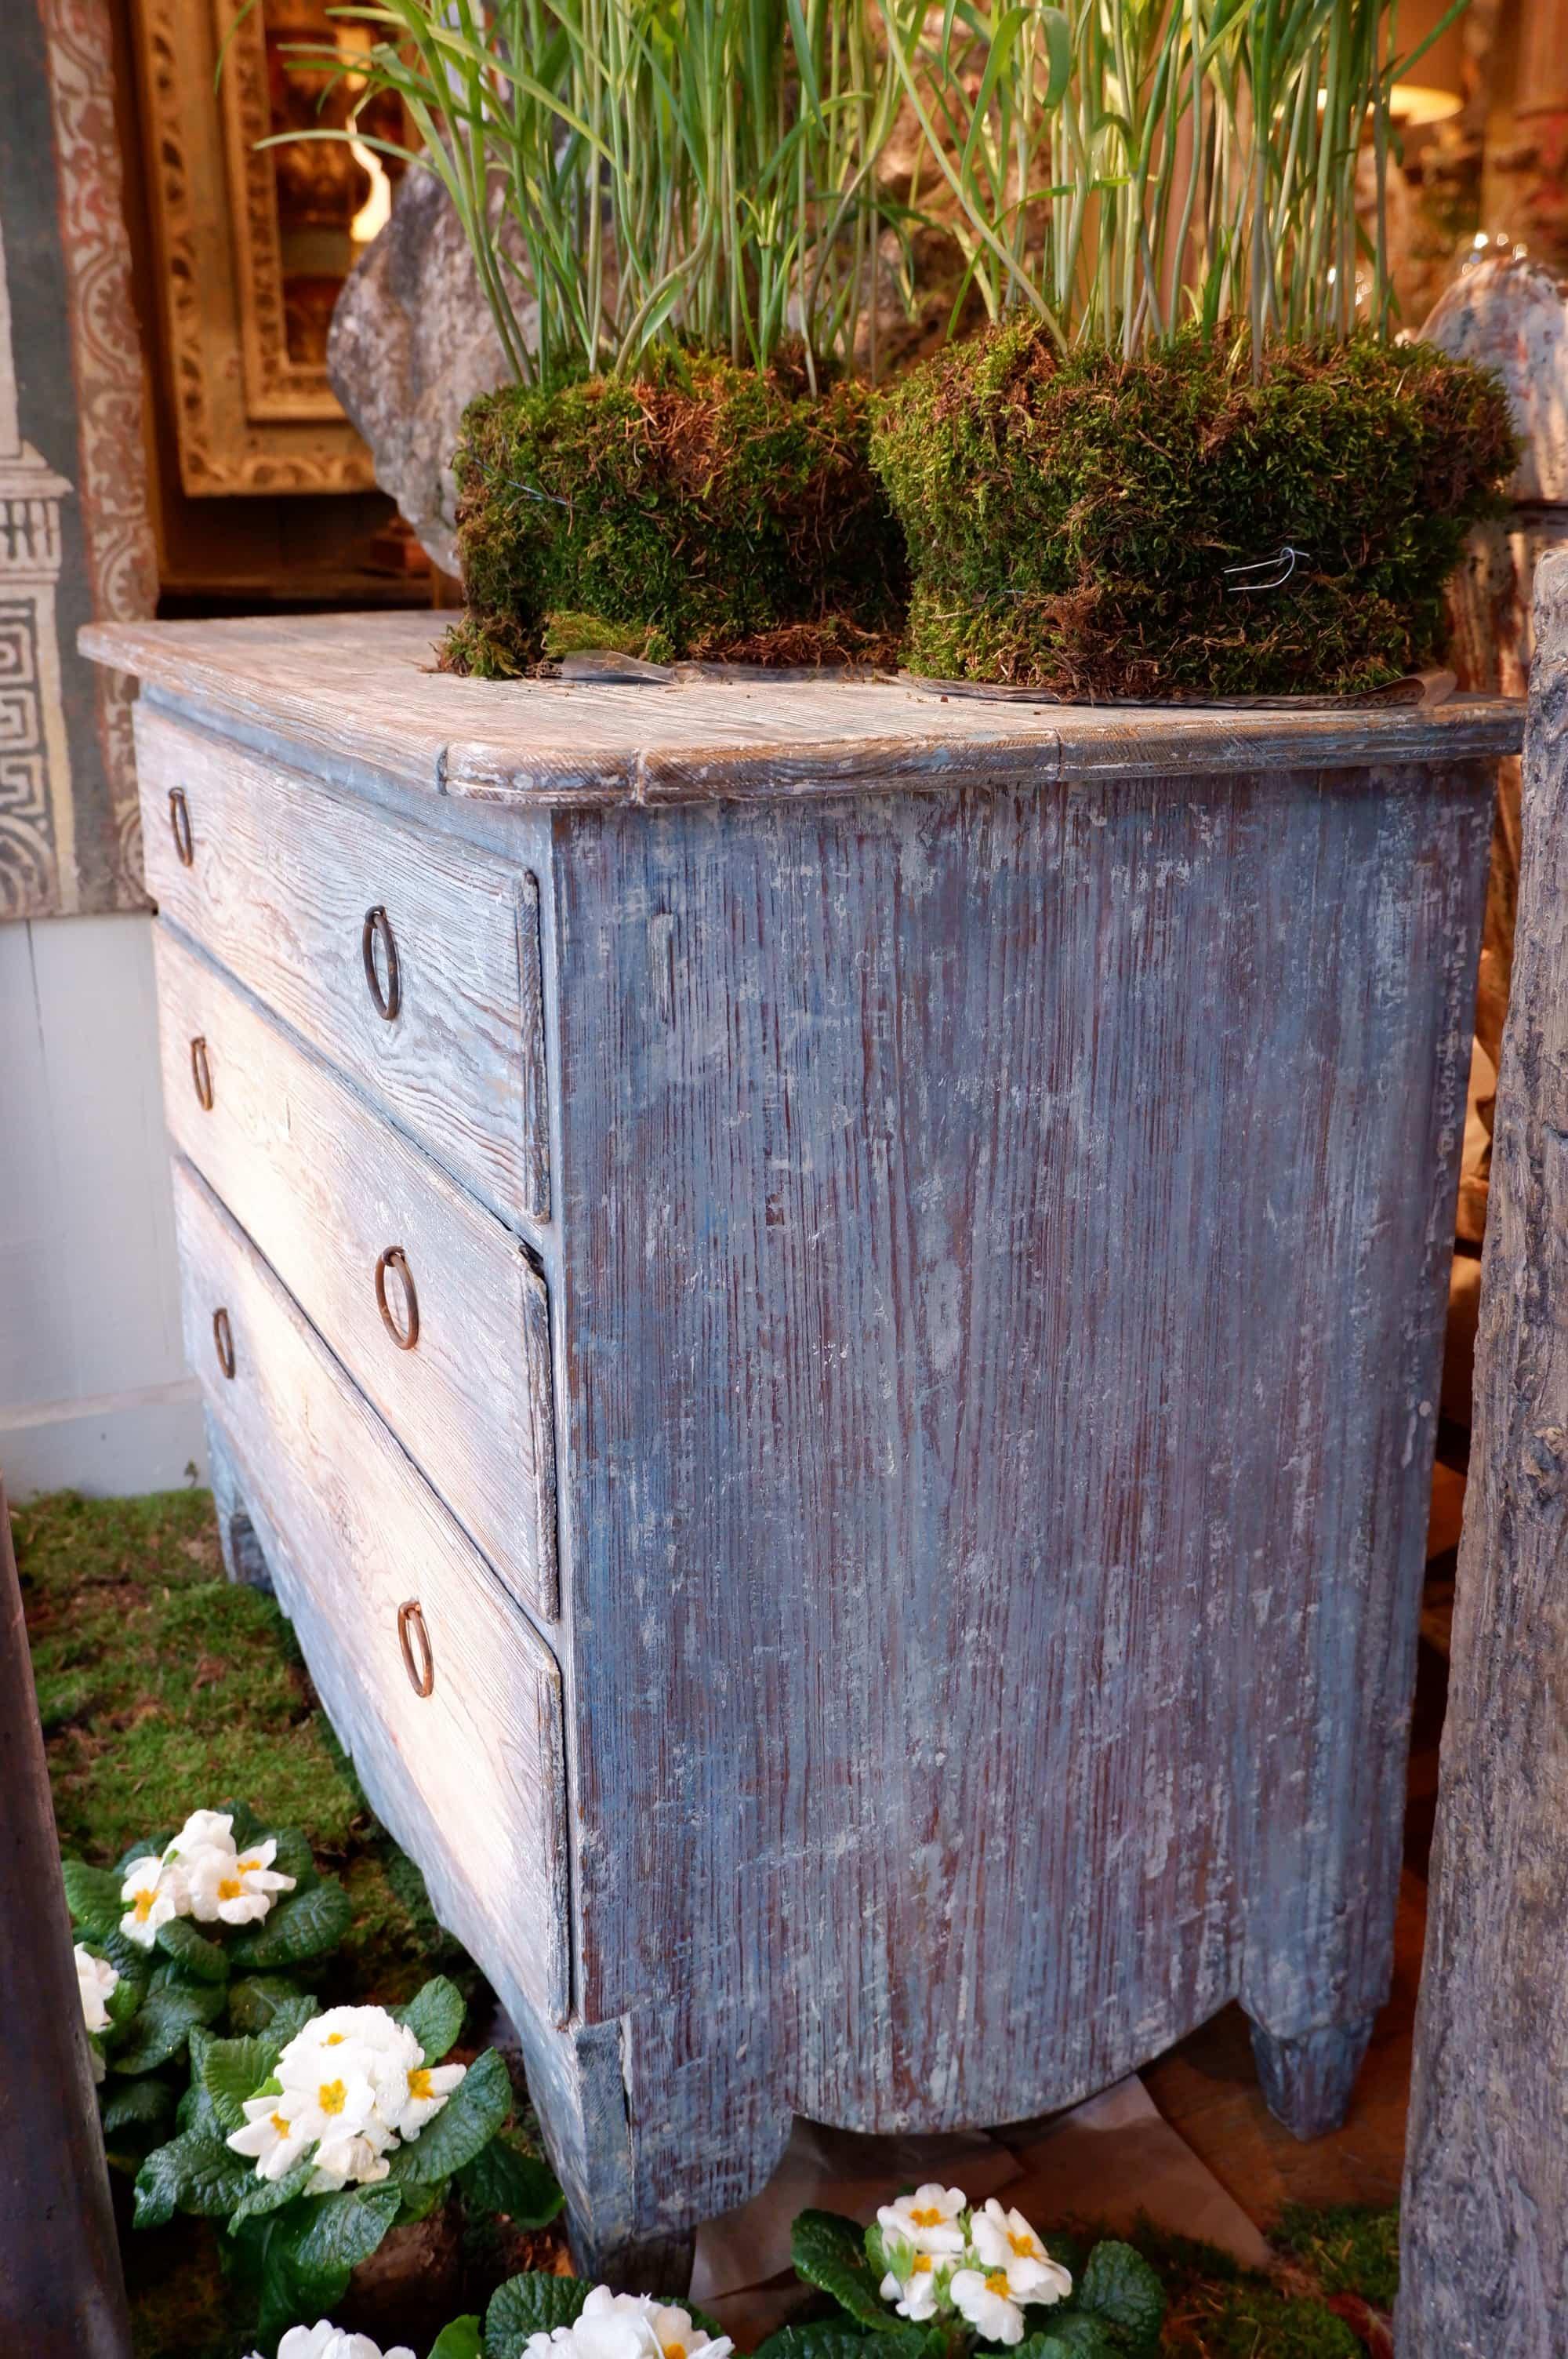 Commode gustavienne en bois peint bleu XIXe